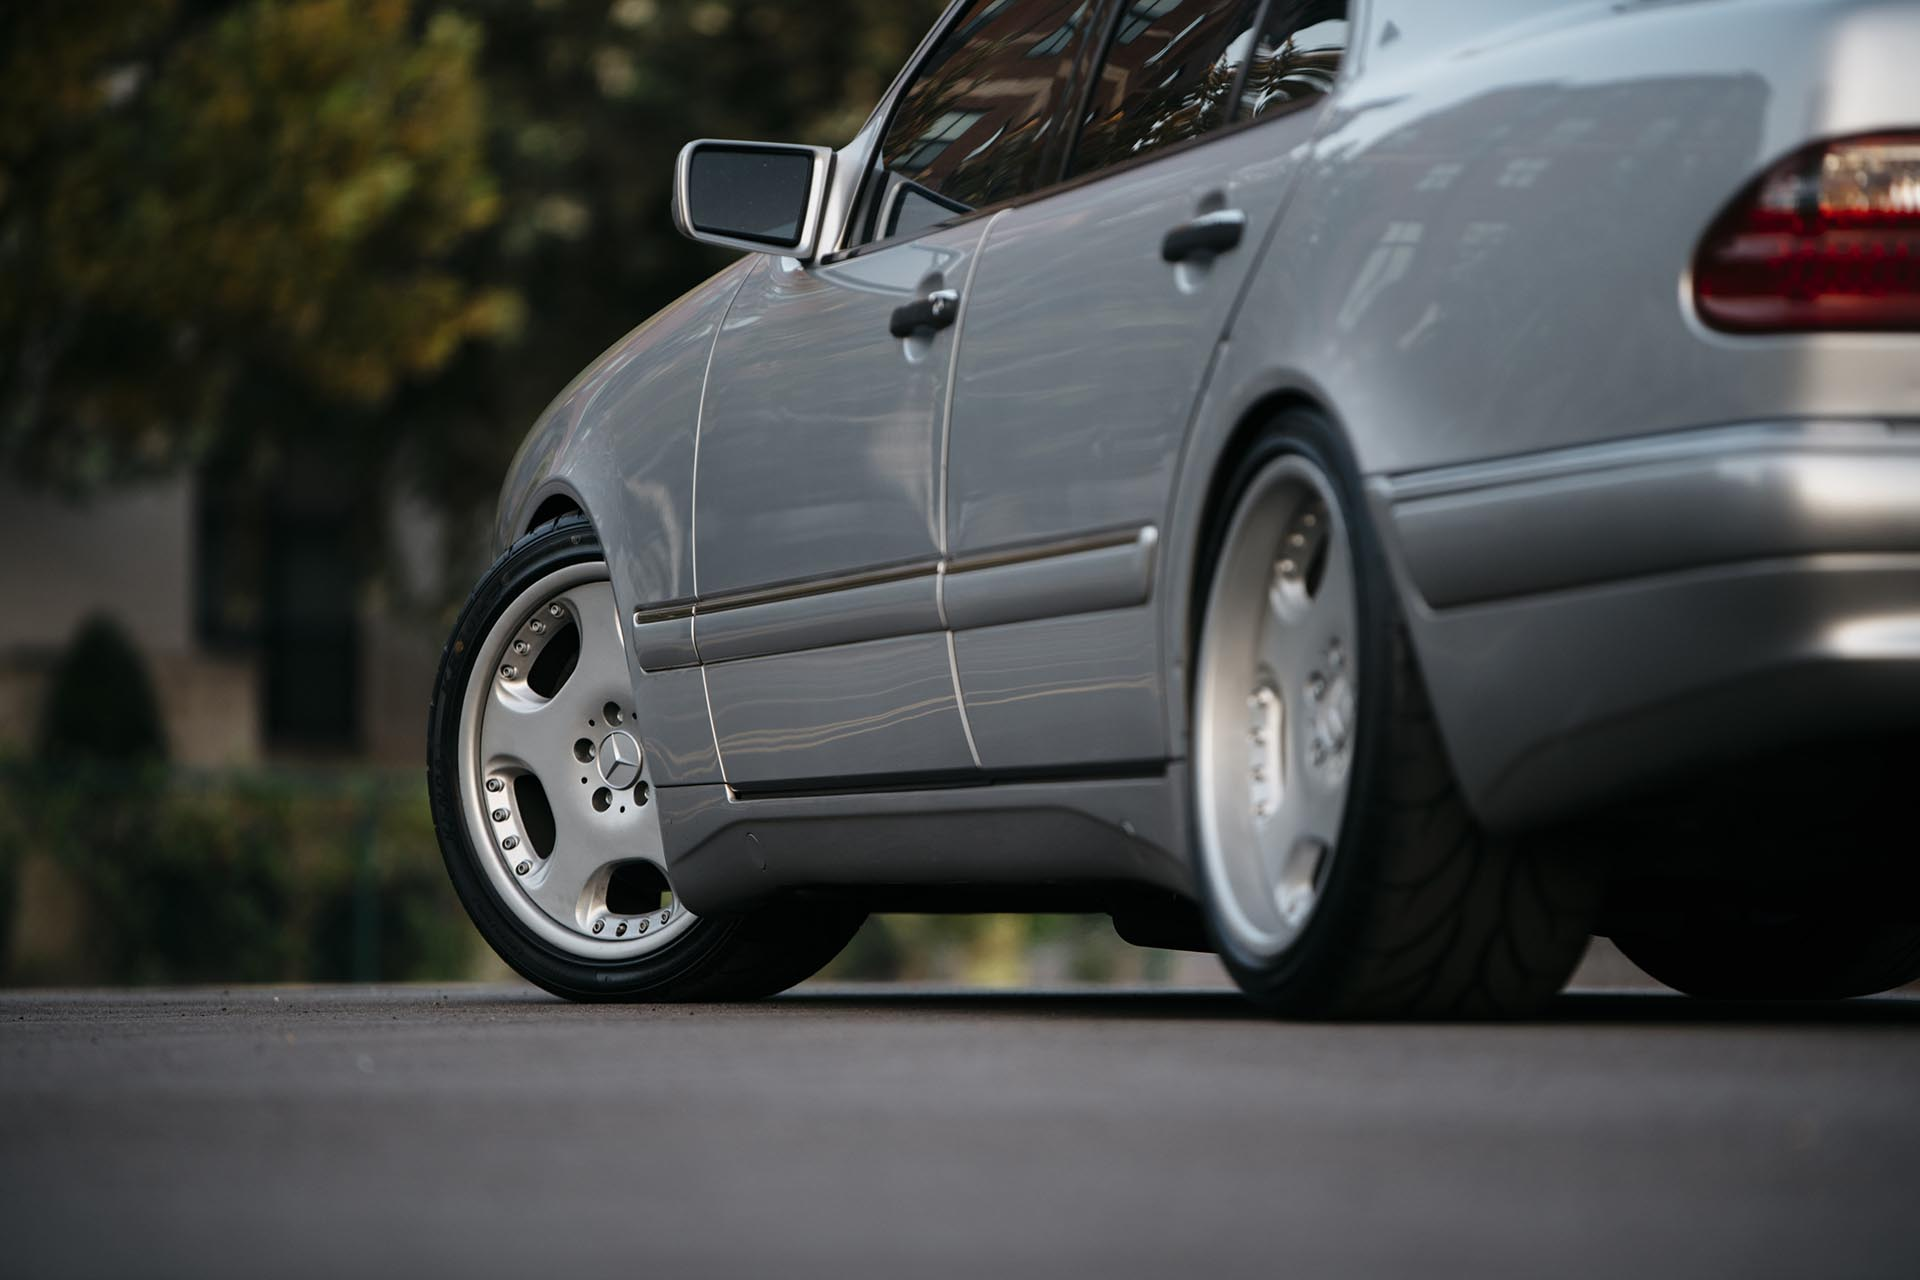 09_Mercedes-Benz E55 AMG manual swapped OZ wheels